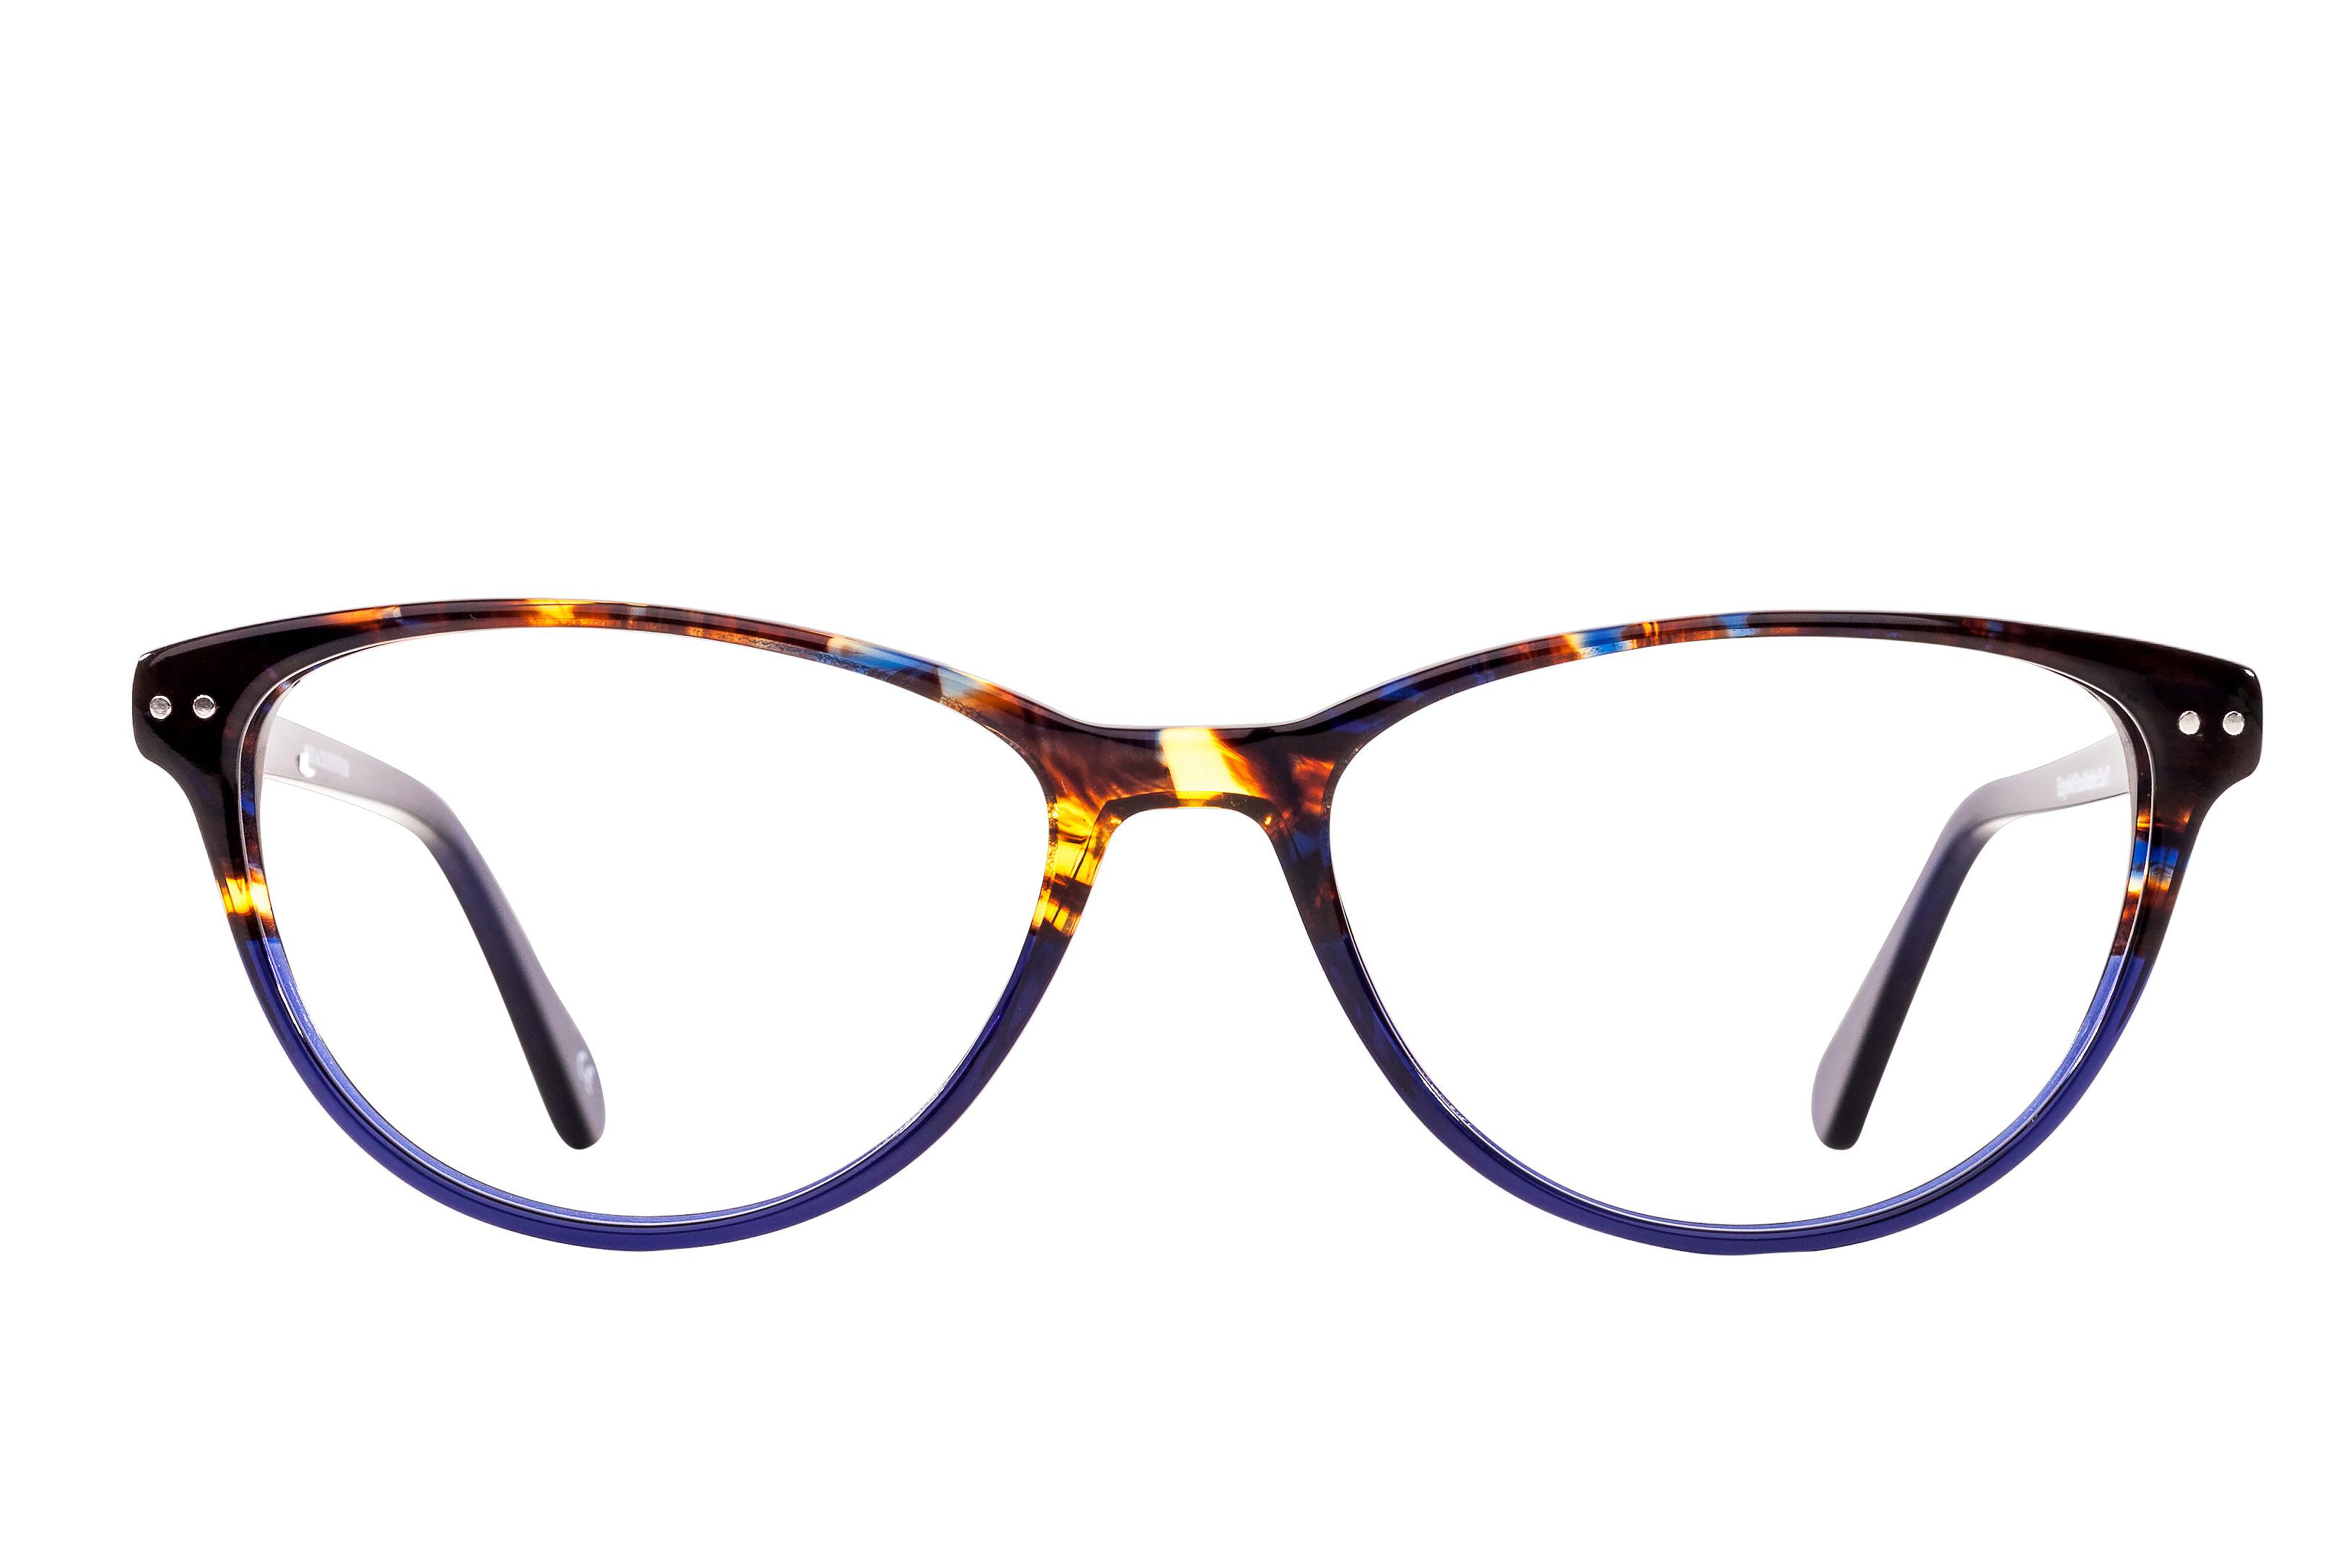 Edgefold Blue-Marble designer glasses   A Family Optician